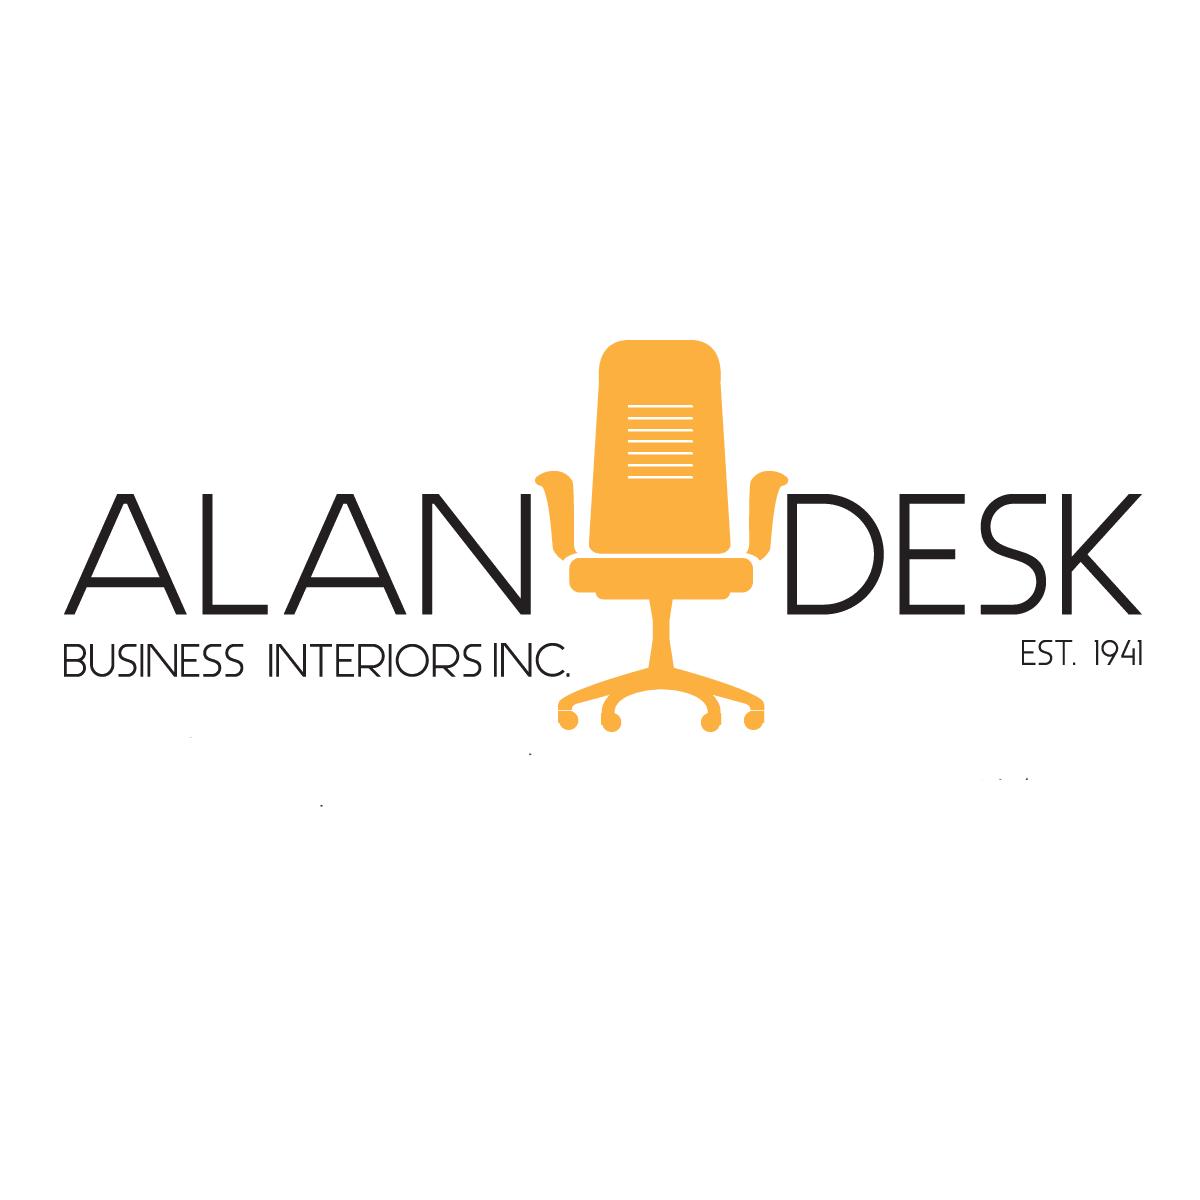 Alan Desk Business Interiors Inc. image 0